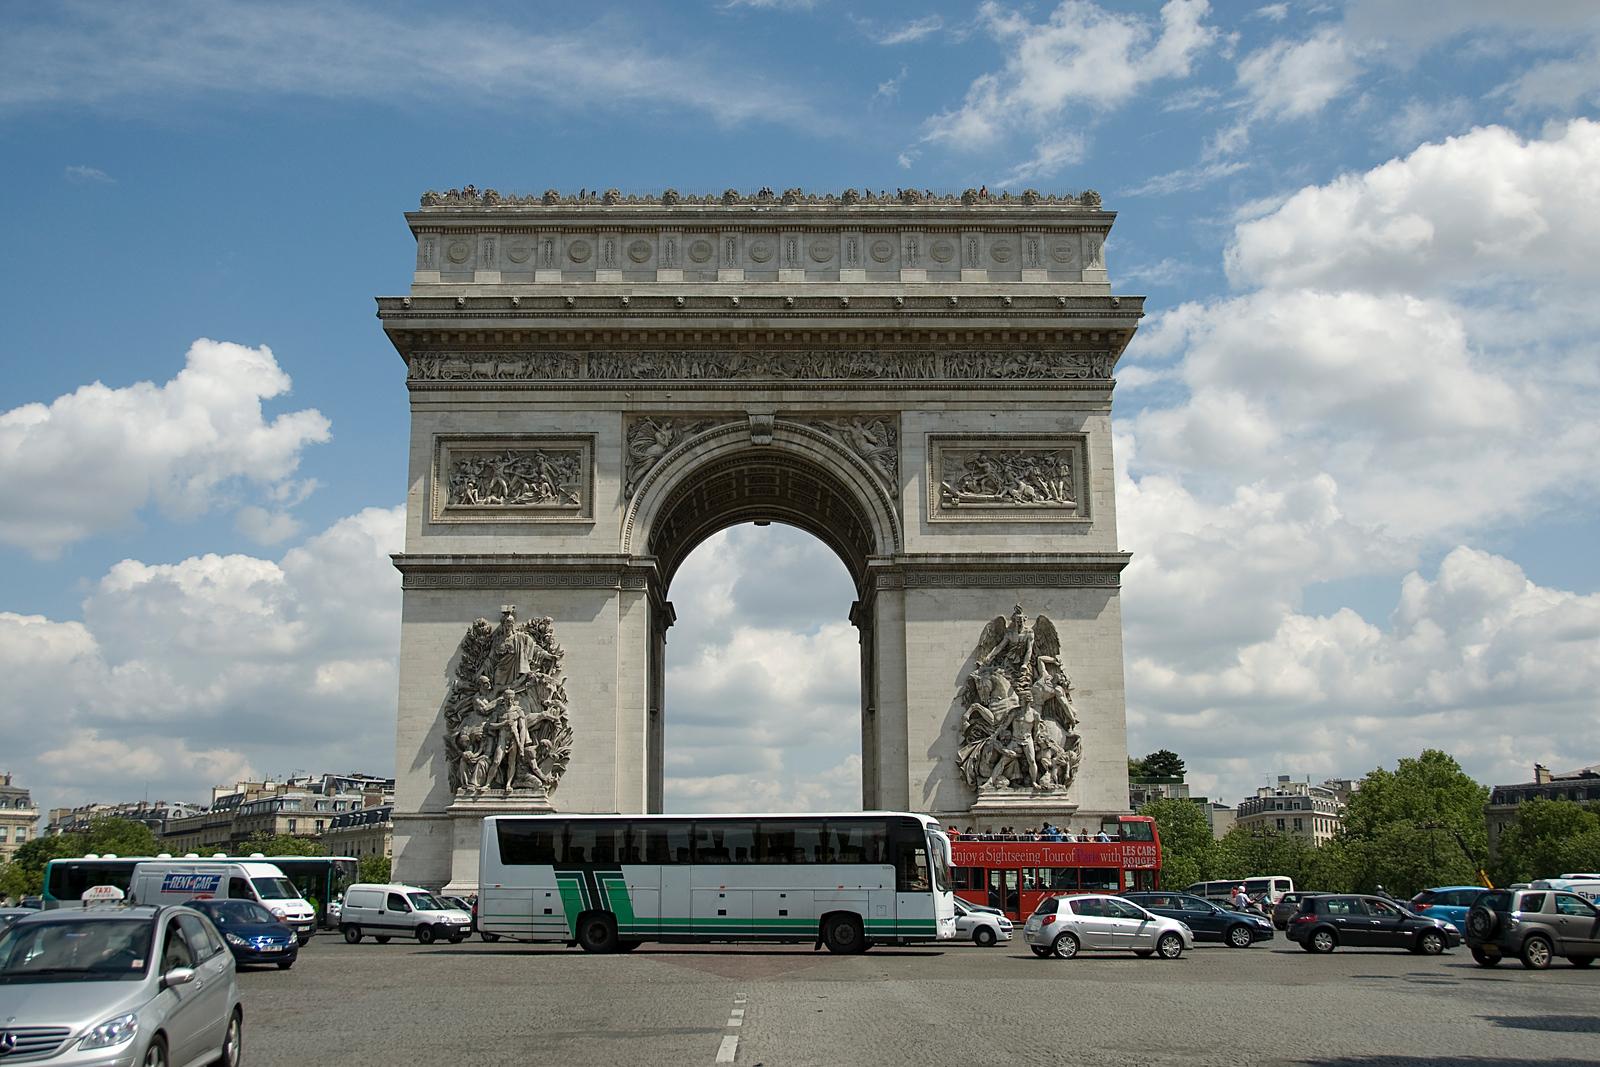 Profile of the Arc de Triomphe in Paris, France